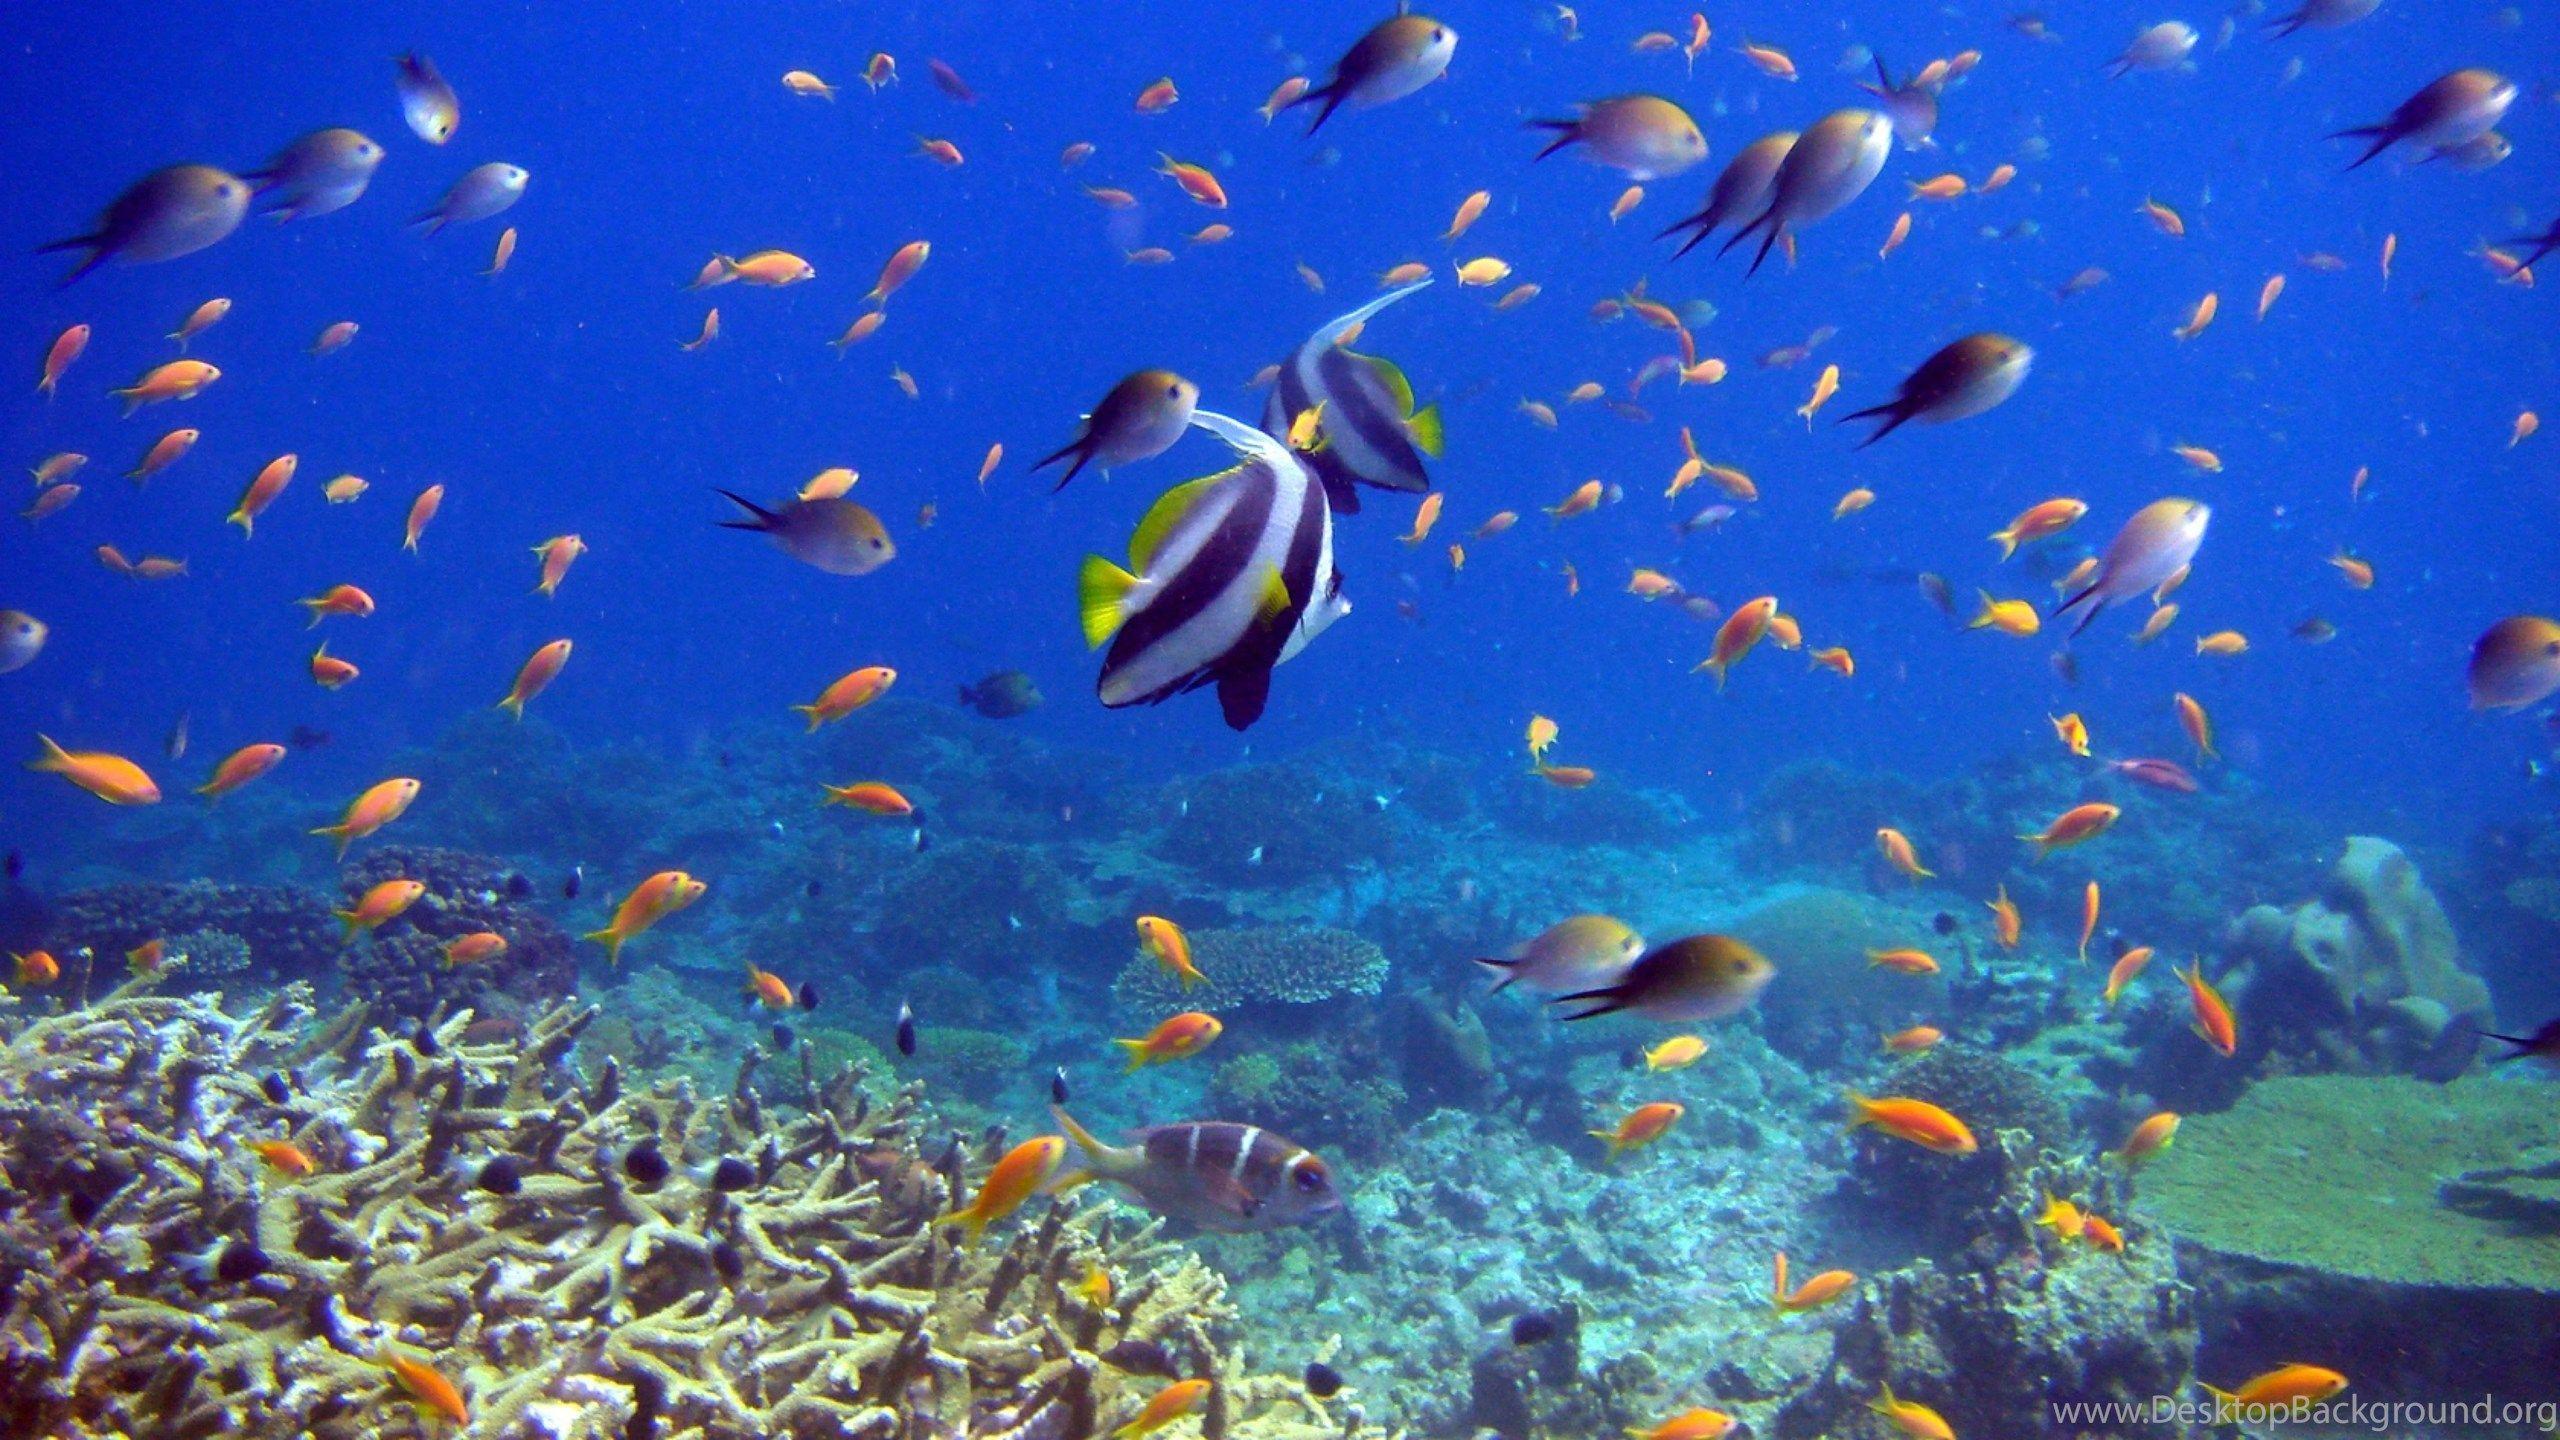 4k Ultra Hd Underwater Wallpapers Top Free 4k Ultra Hd Underwater